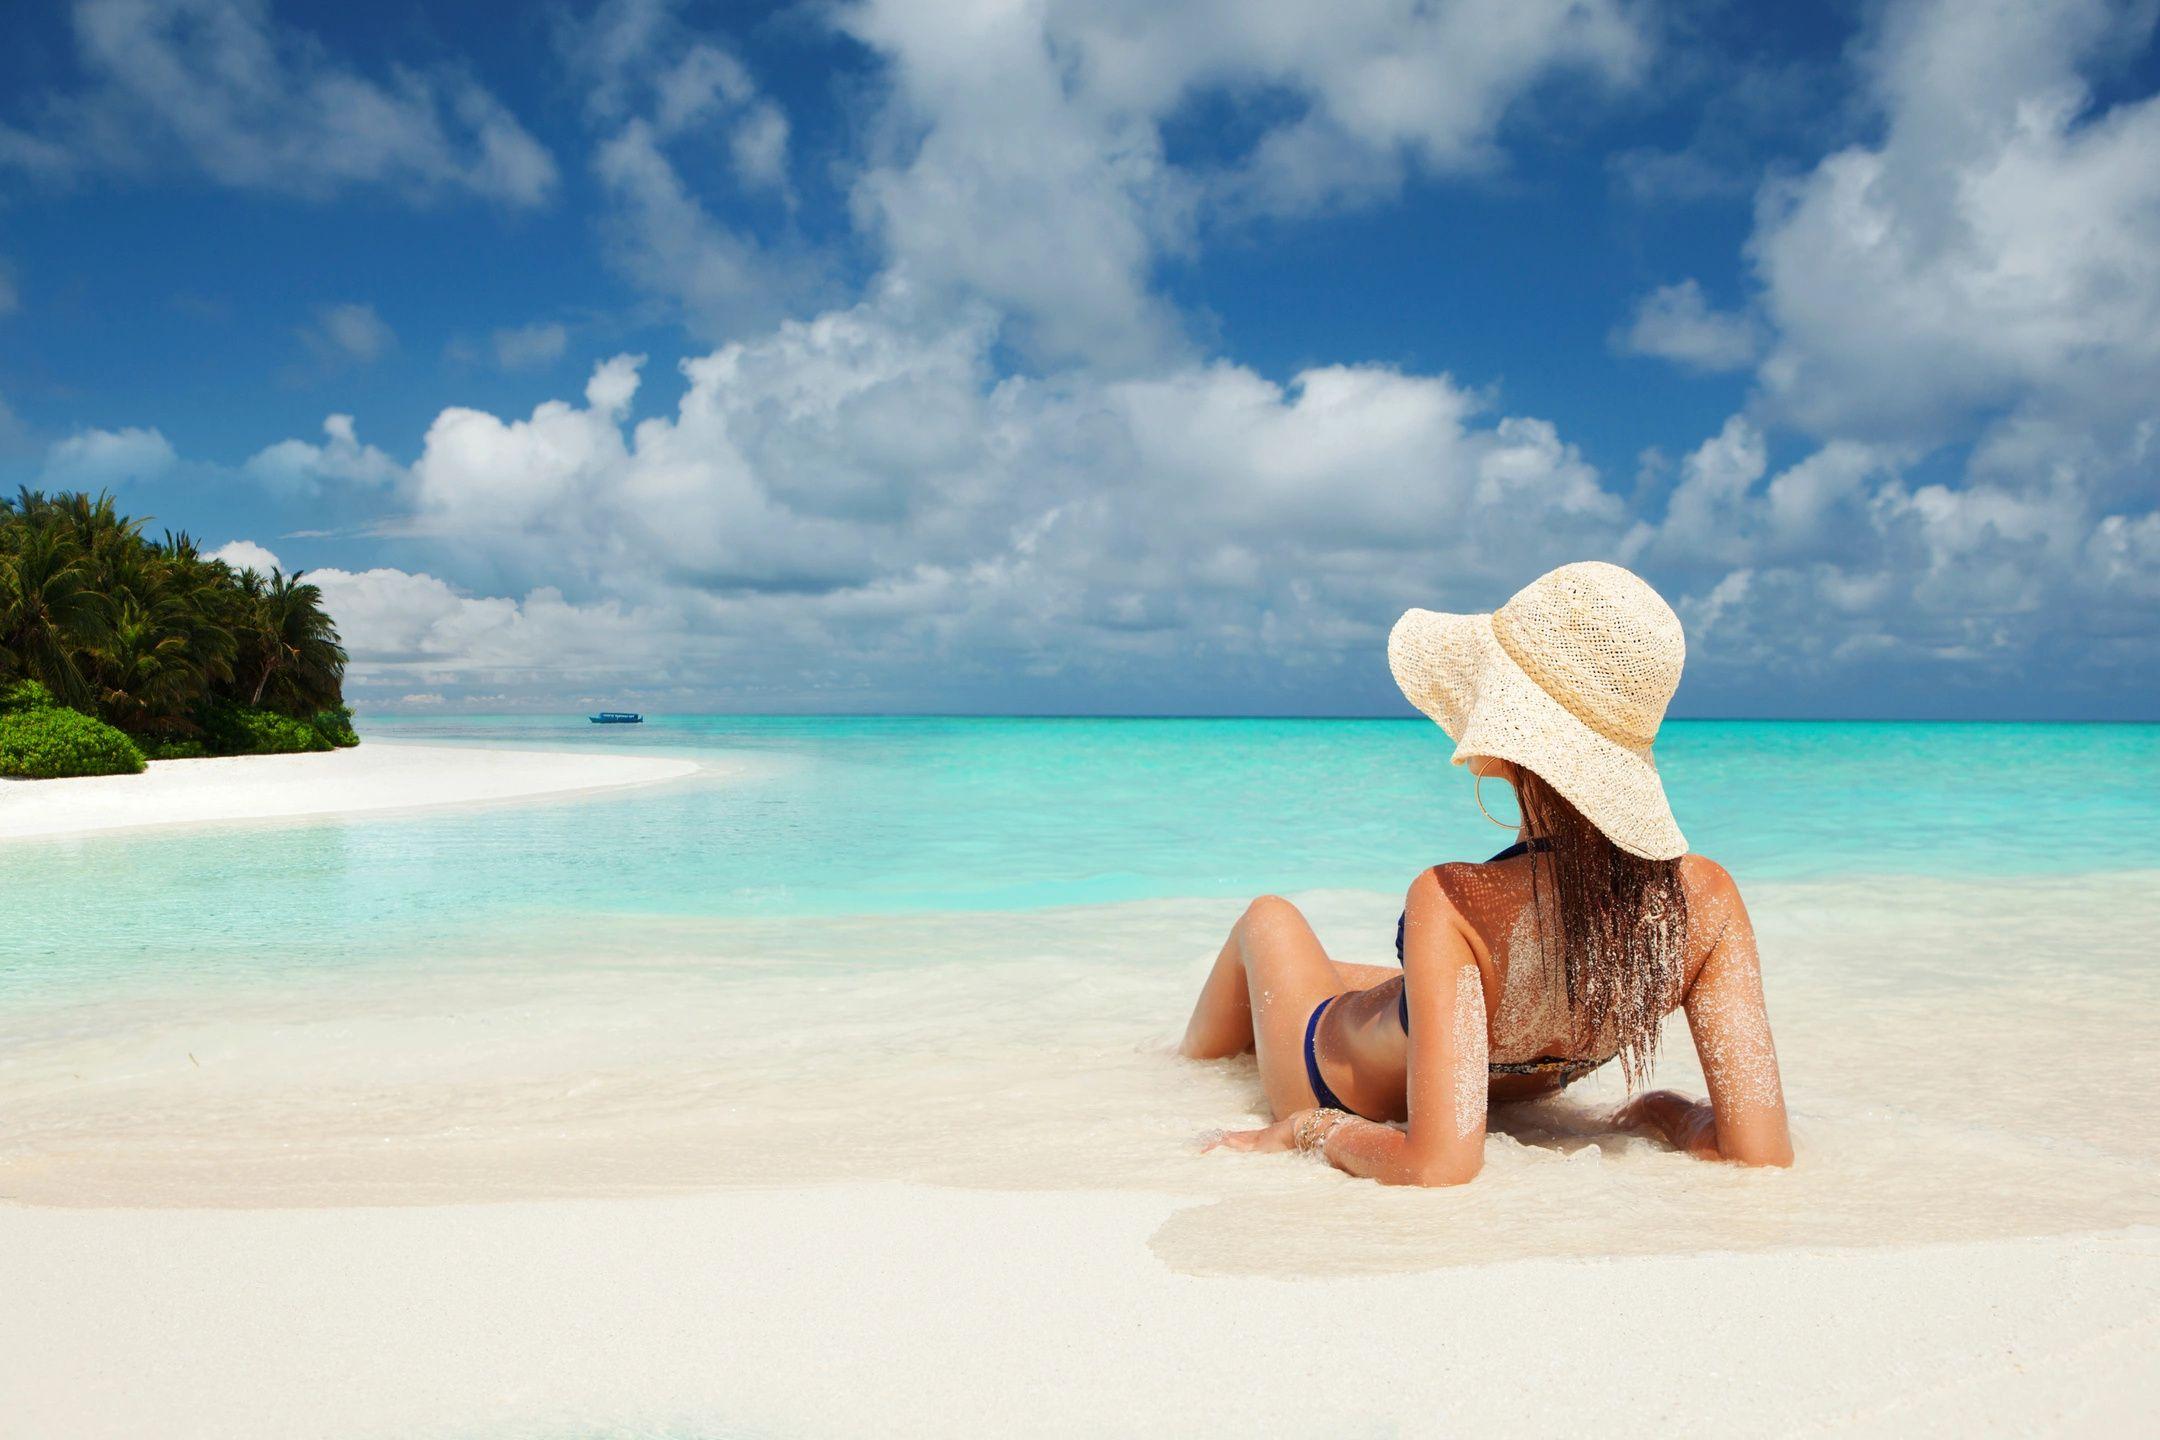 Playa Blanca Beach Resort (3 noches / 4 días)